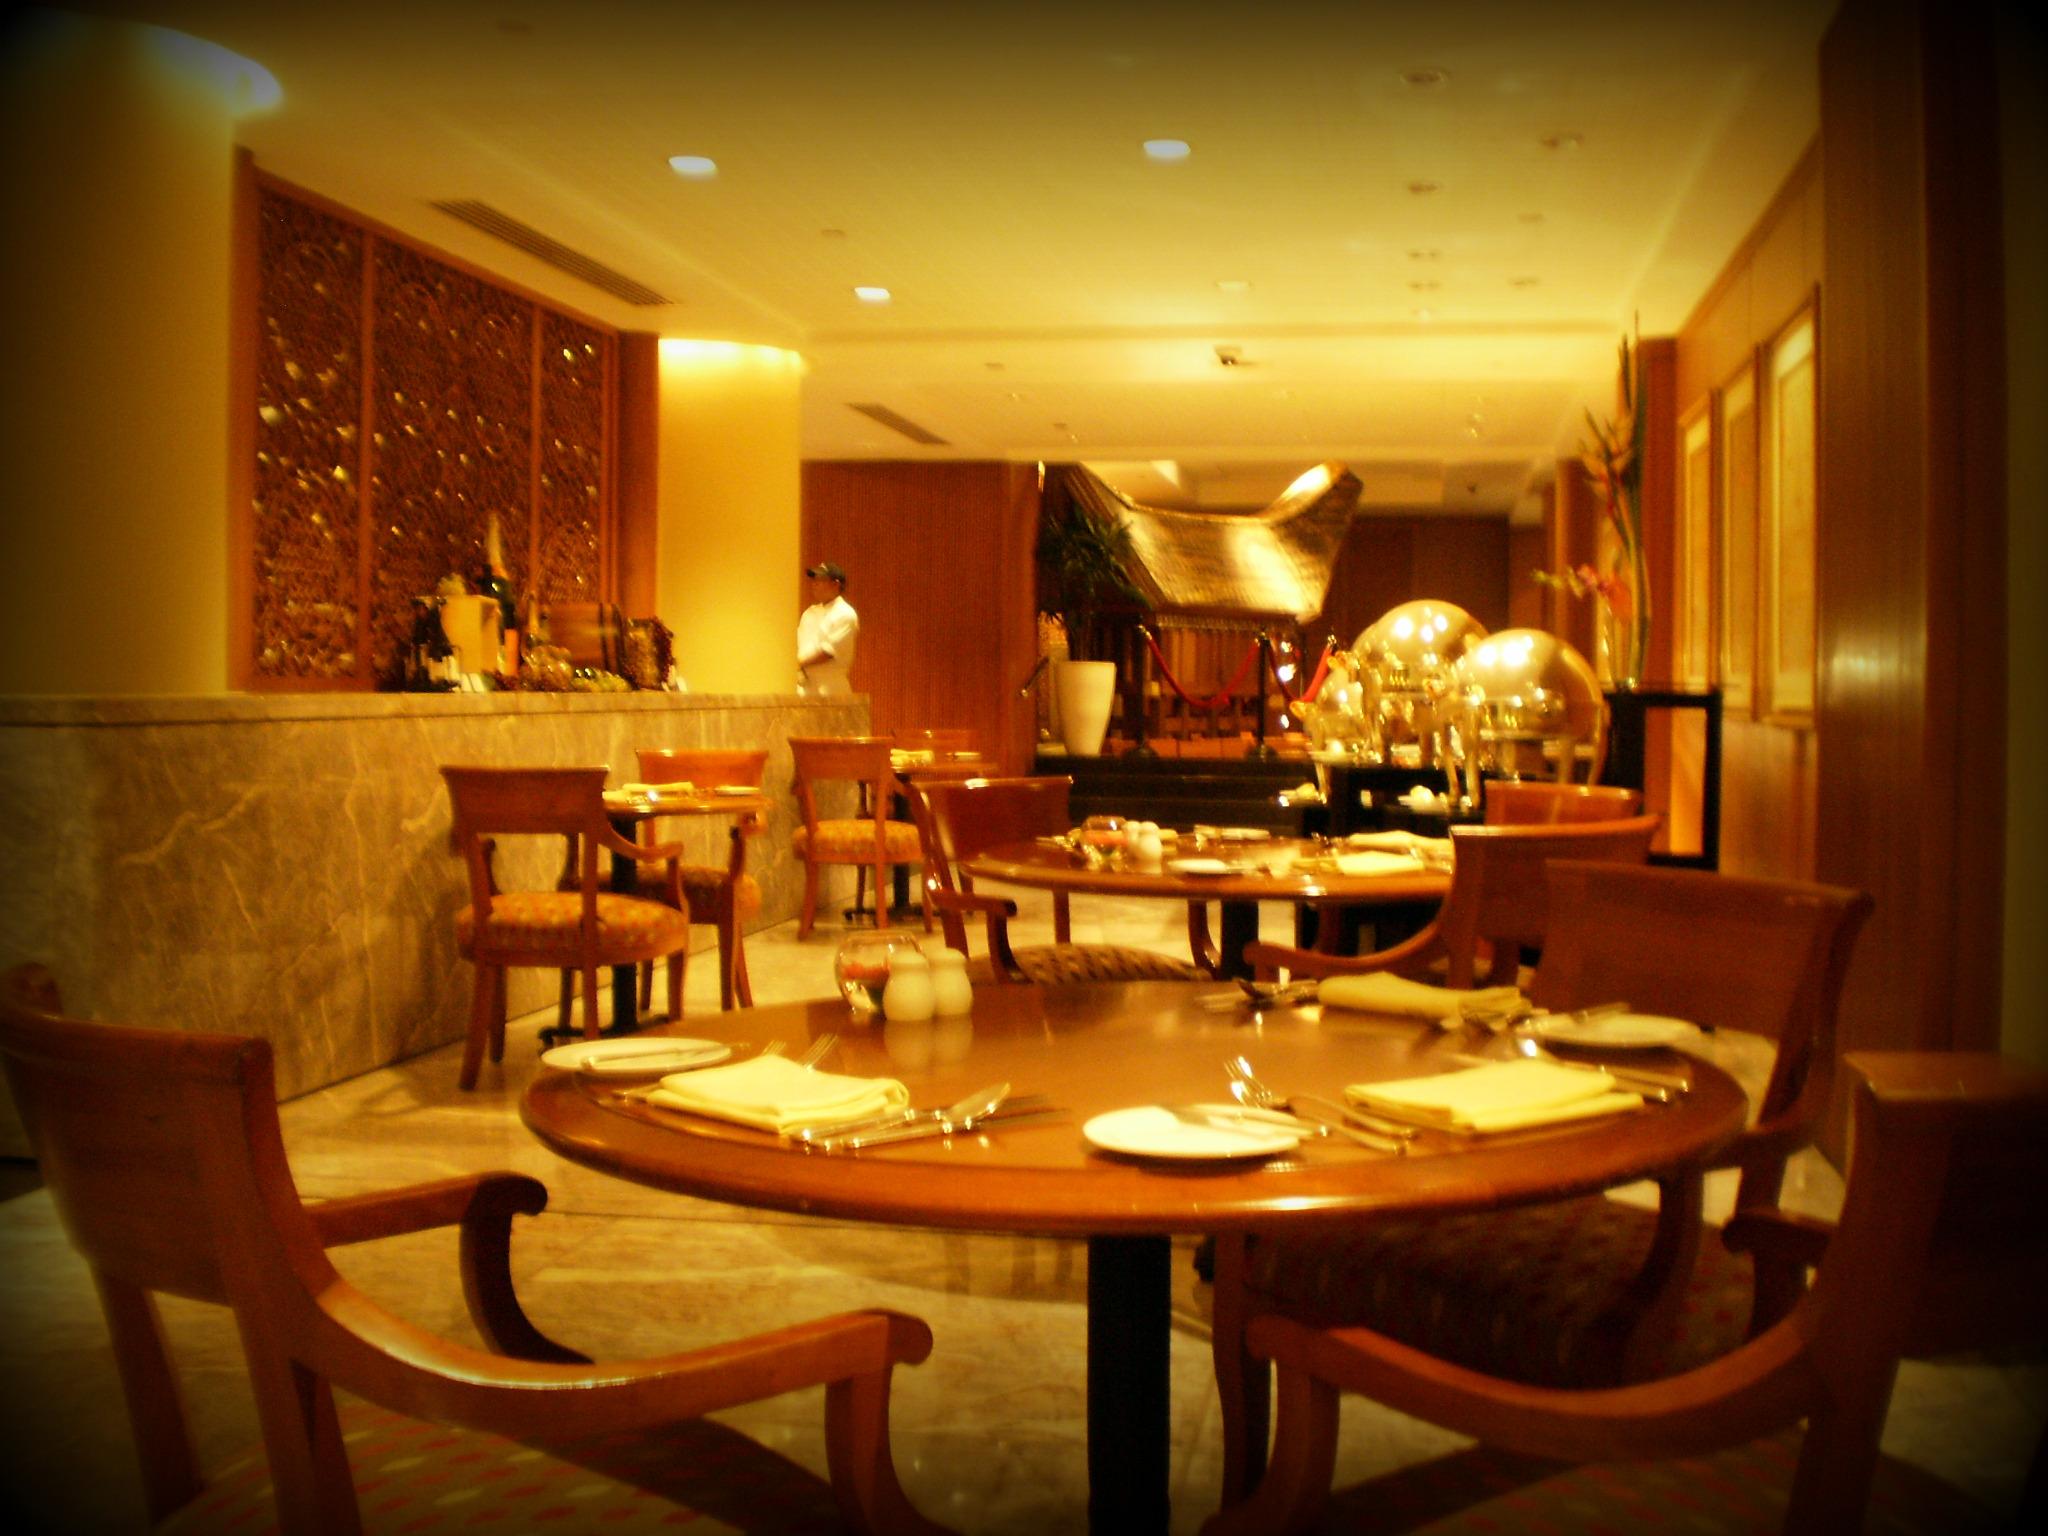 p4240064e Brutal Dinner at Seasons Cafe